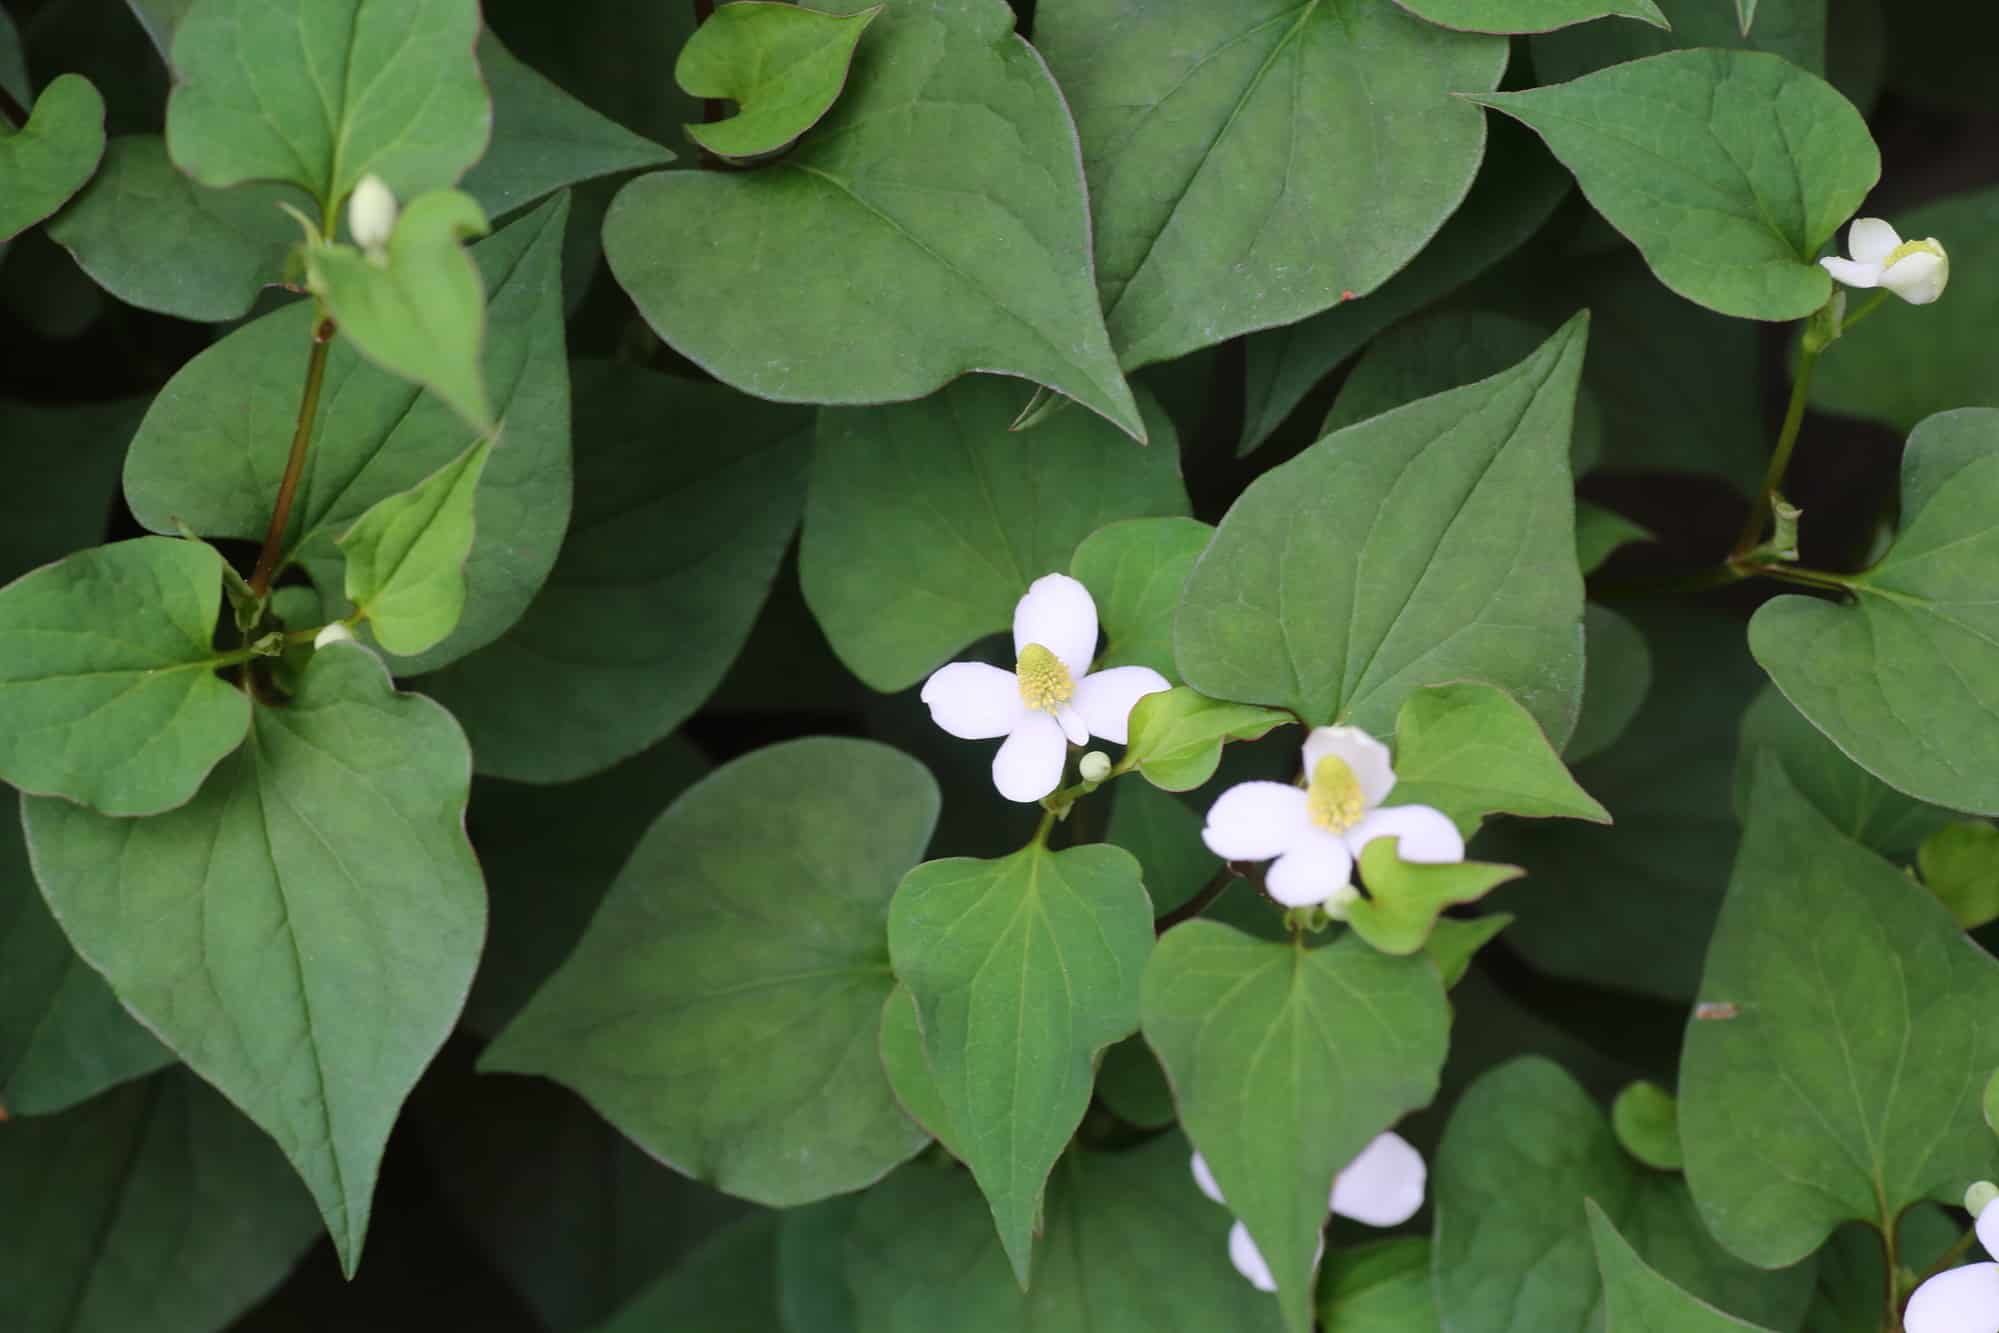 Houttuynia Cordata: The Fish Herb